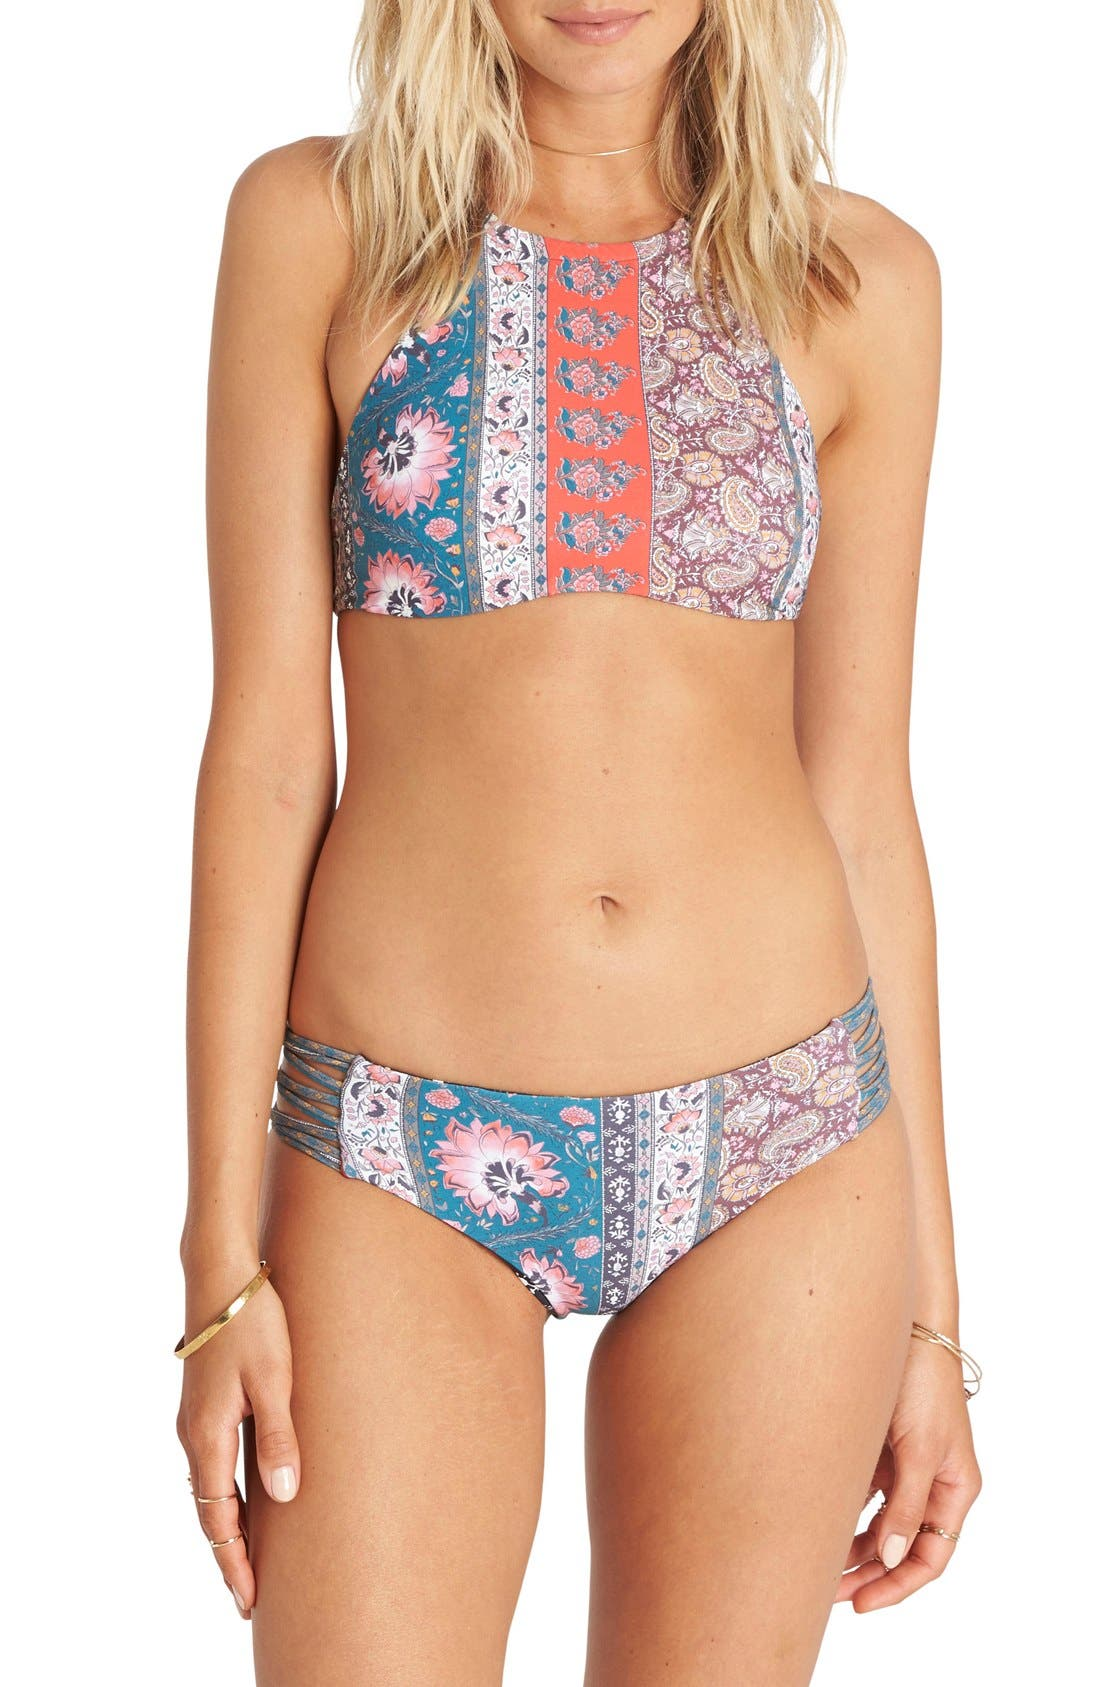 Alternate Image 1 Selected - Billabong 'Moon Dancer' Floral Print Halter Bikini Top